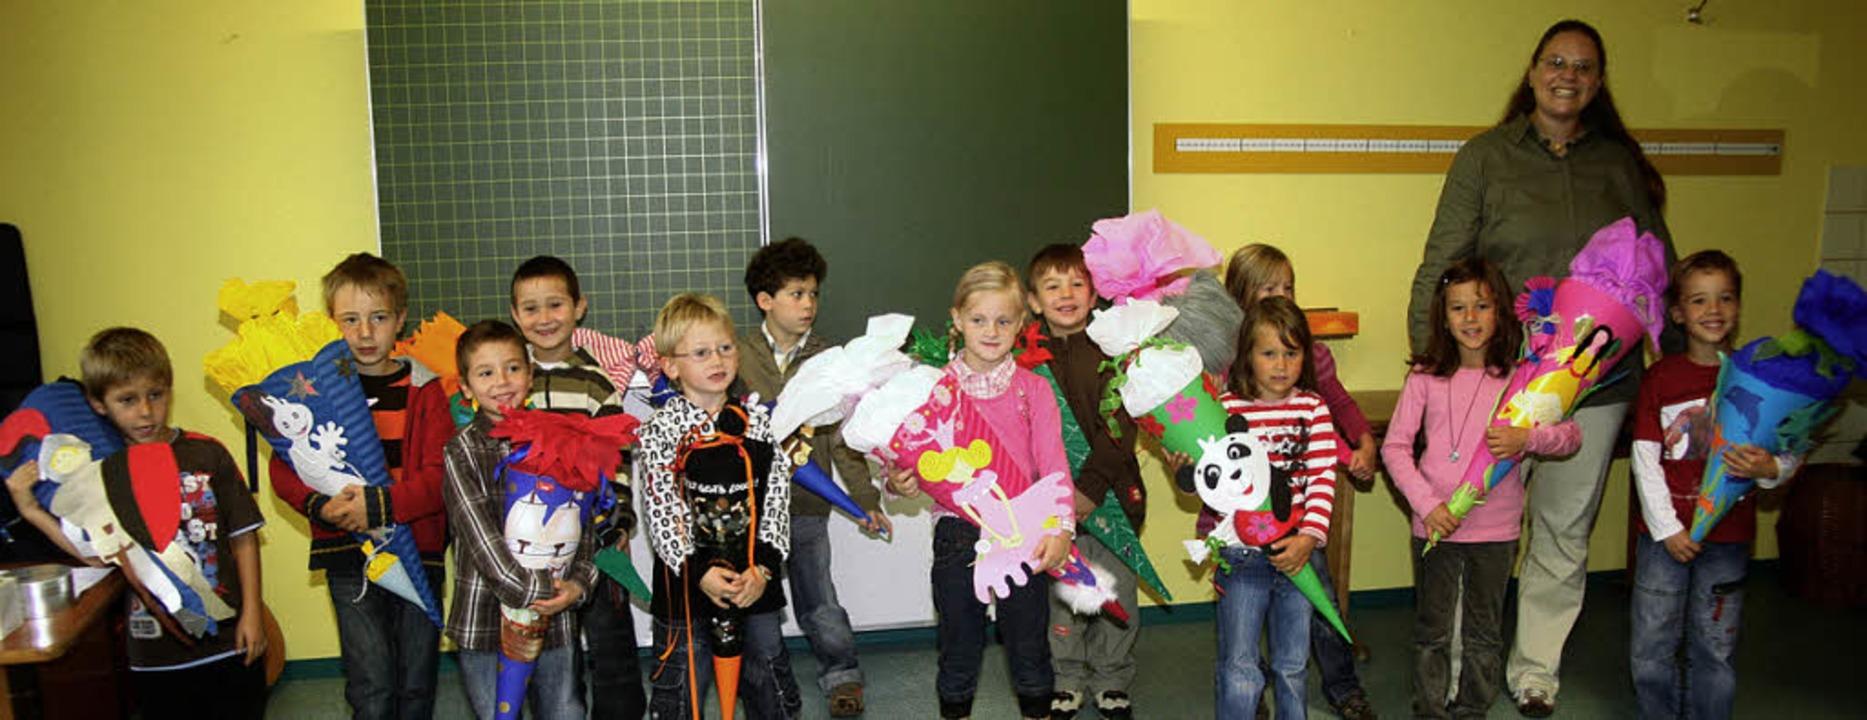 ...die neu eingeschulten Grundschüler in Hasel  | Foto: Fabry